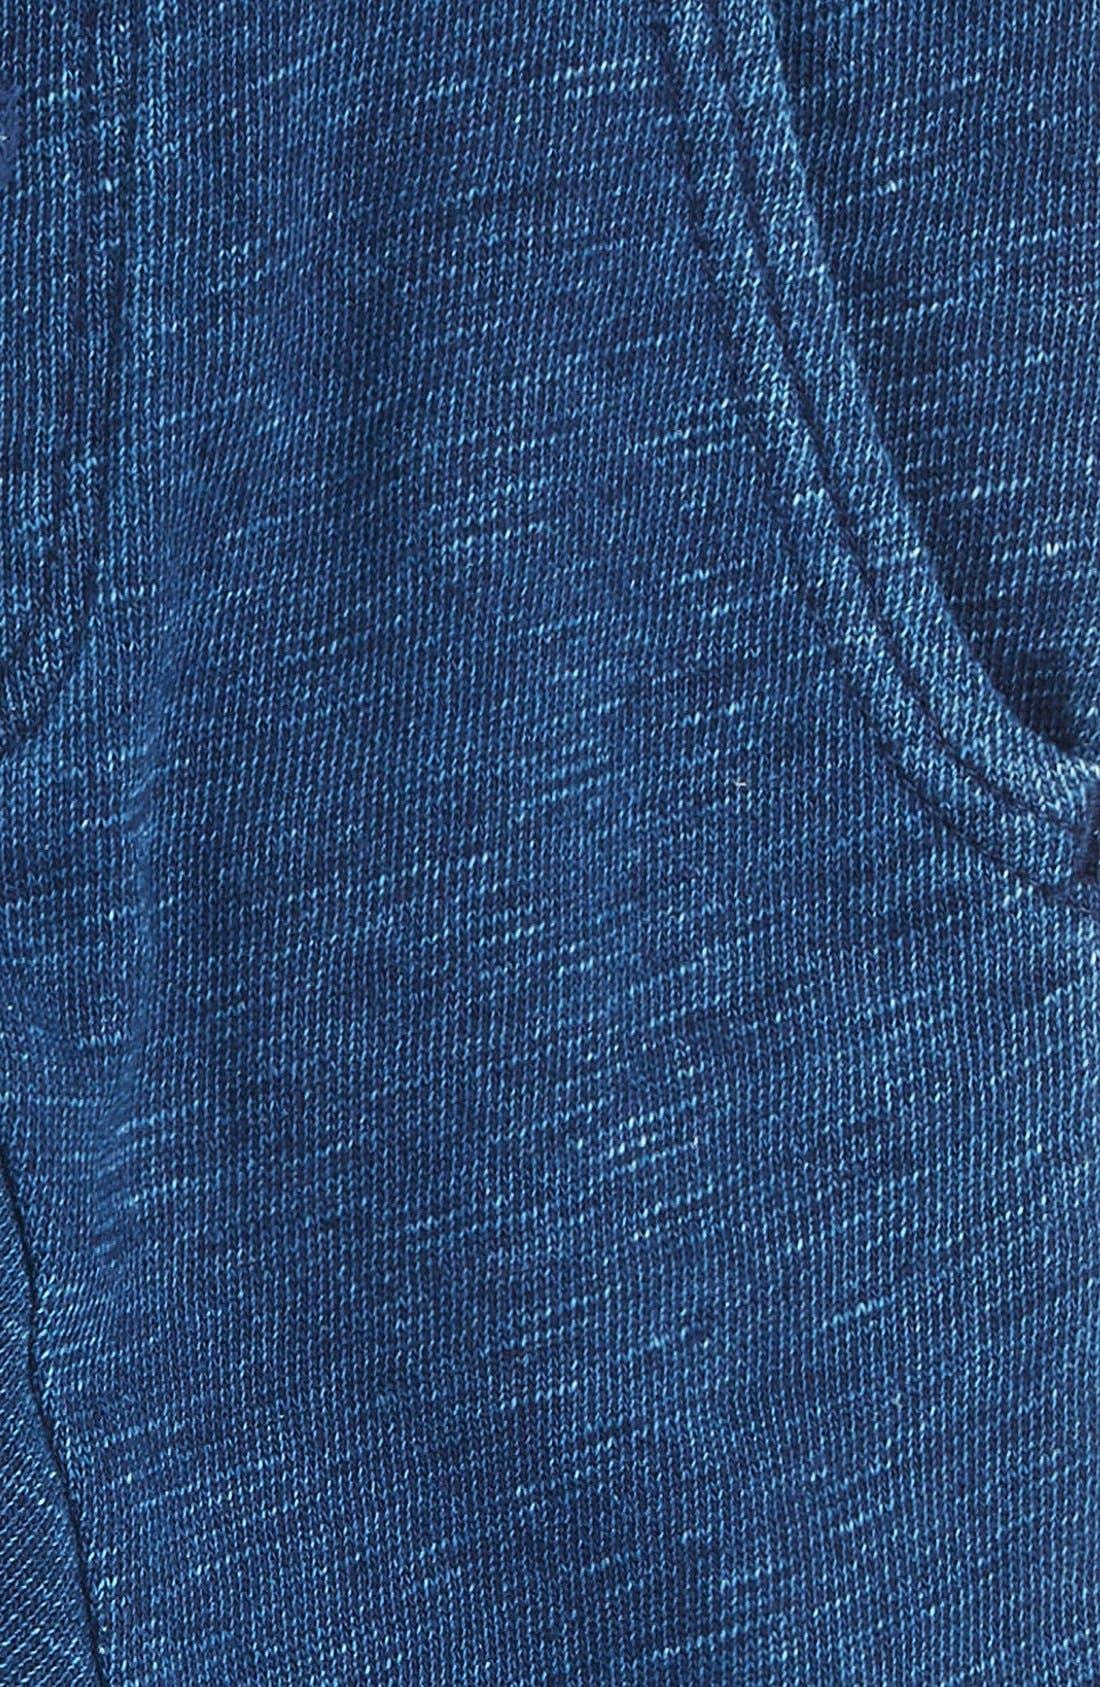 Alternate Image 3  - Splendid Cotton Blend Jogger Pants (Baby Boys)